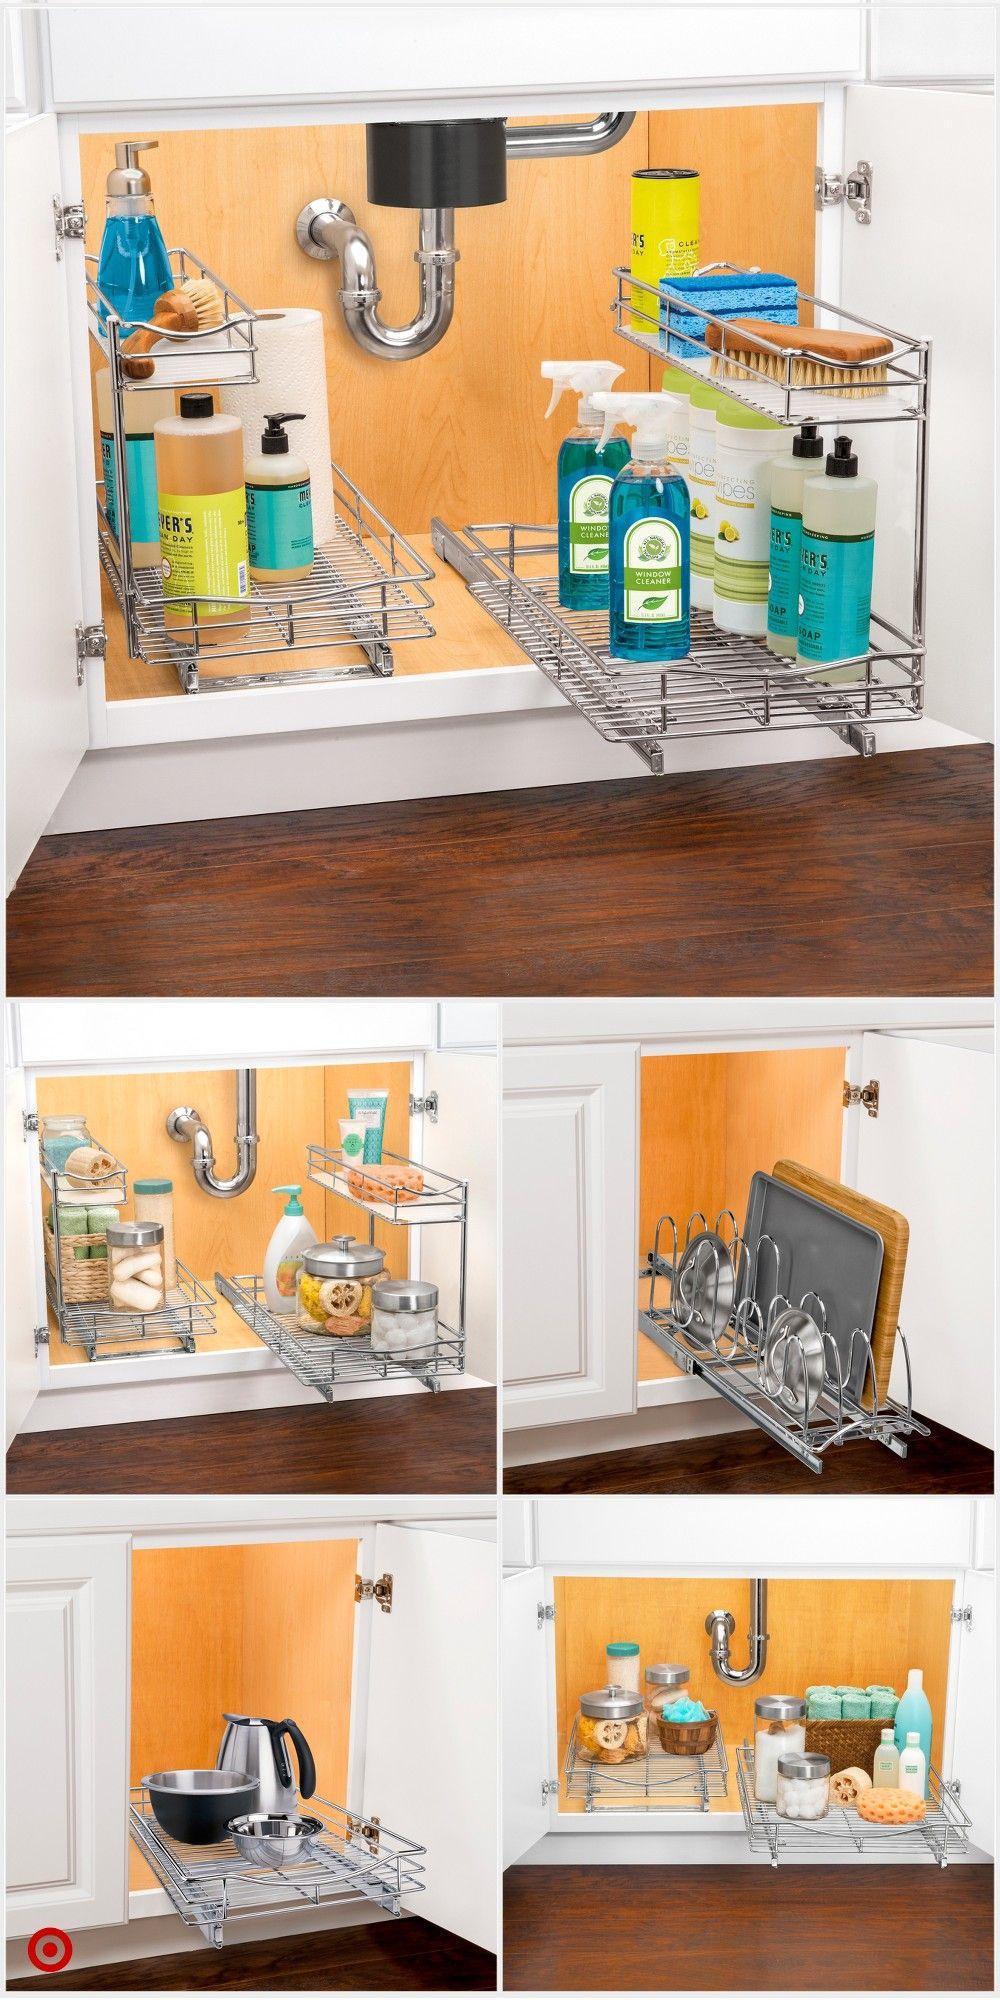 Target Kitchen Cabinets - The Best Home Design